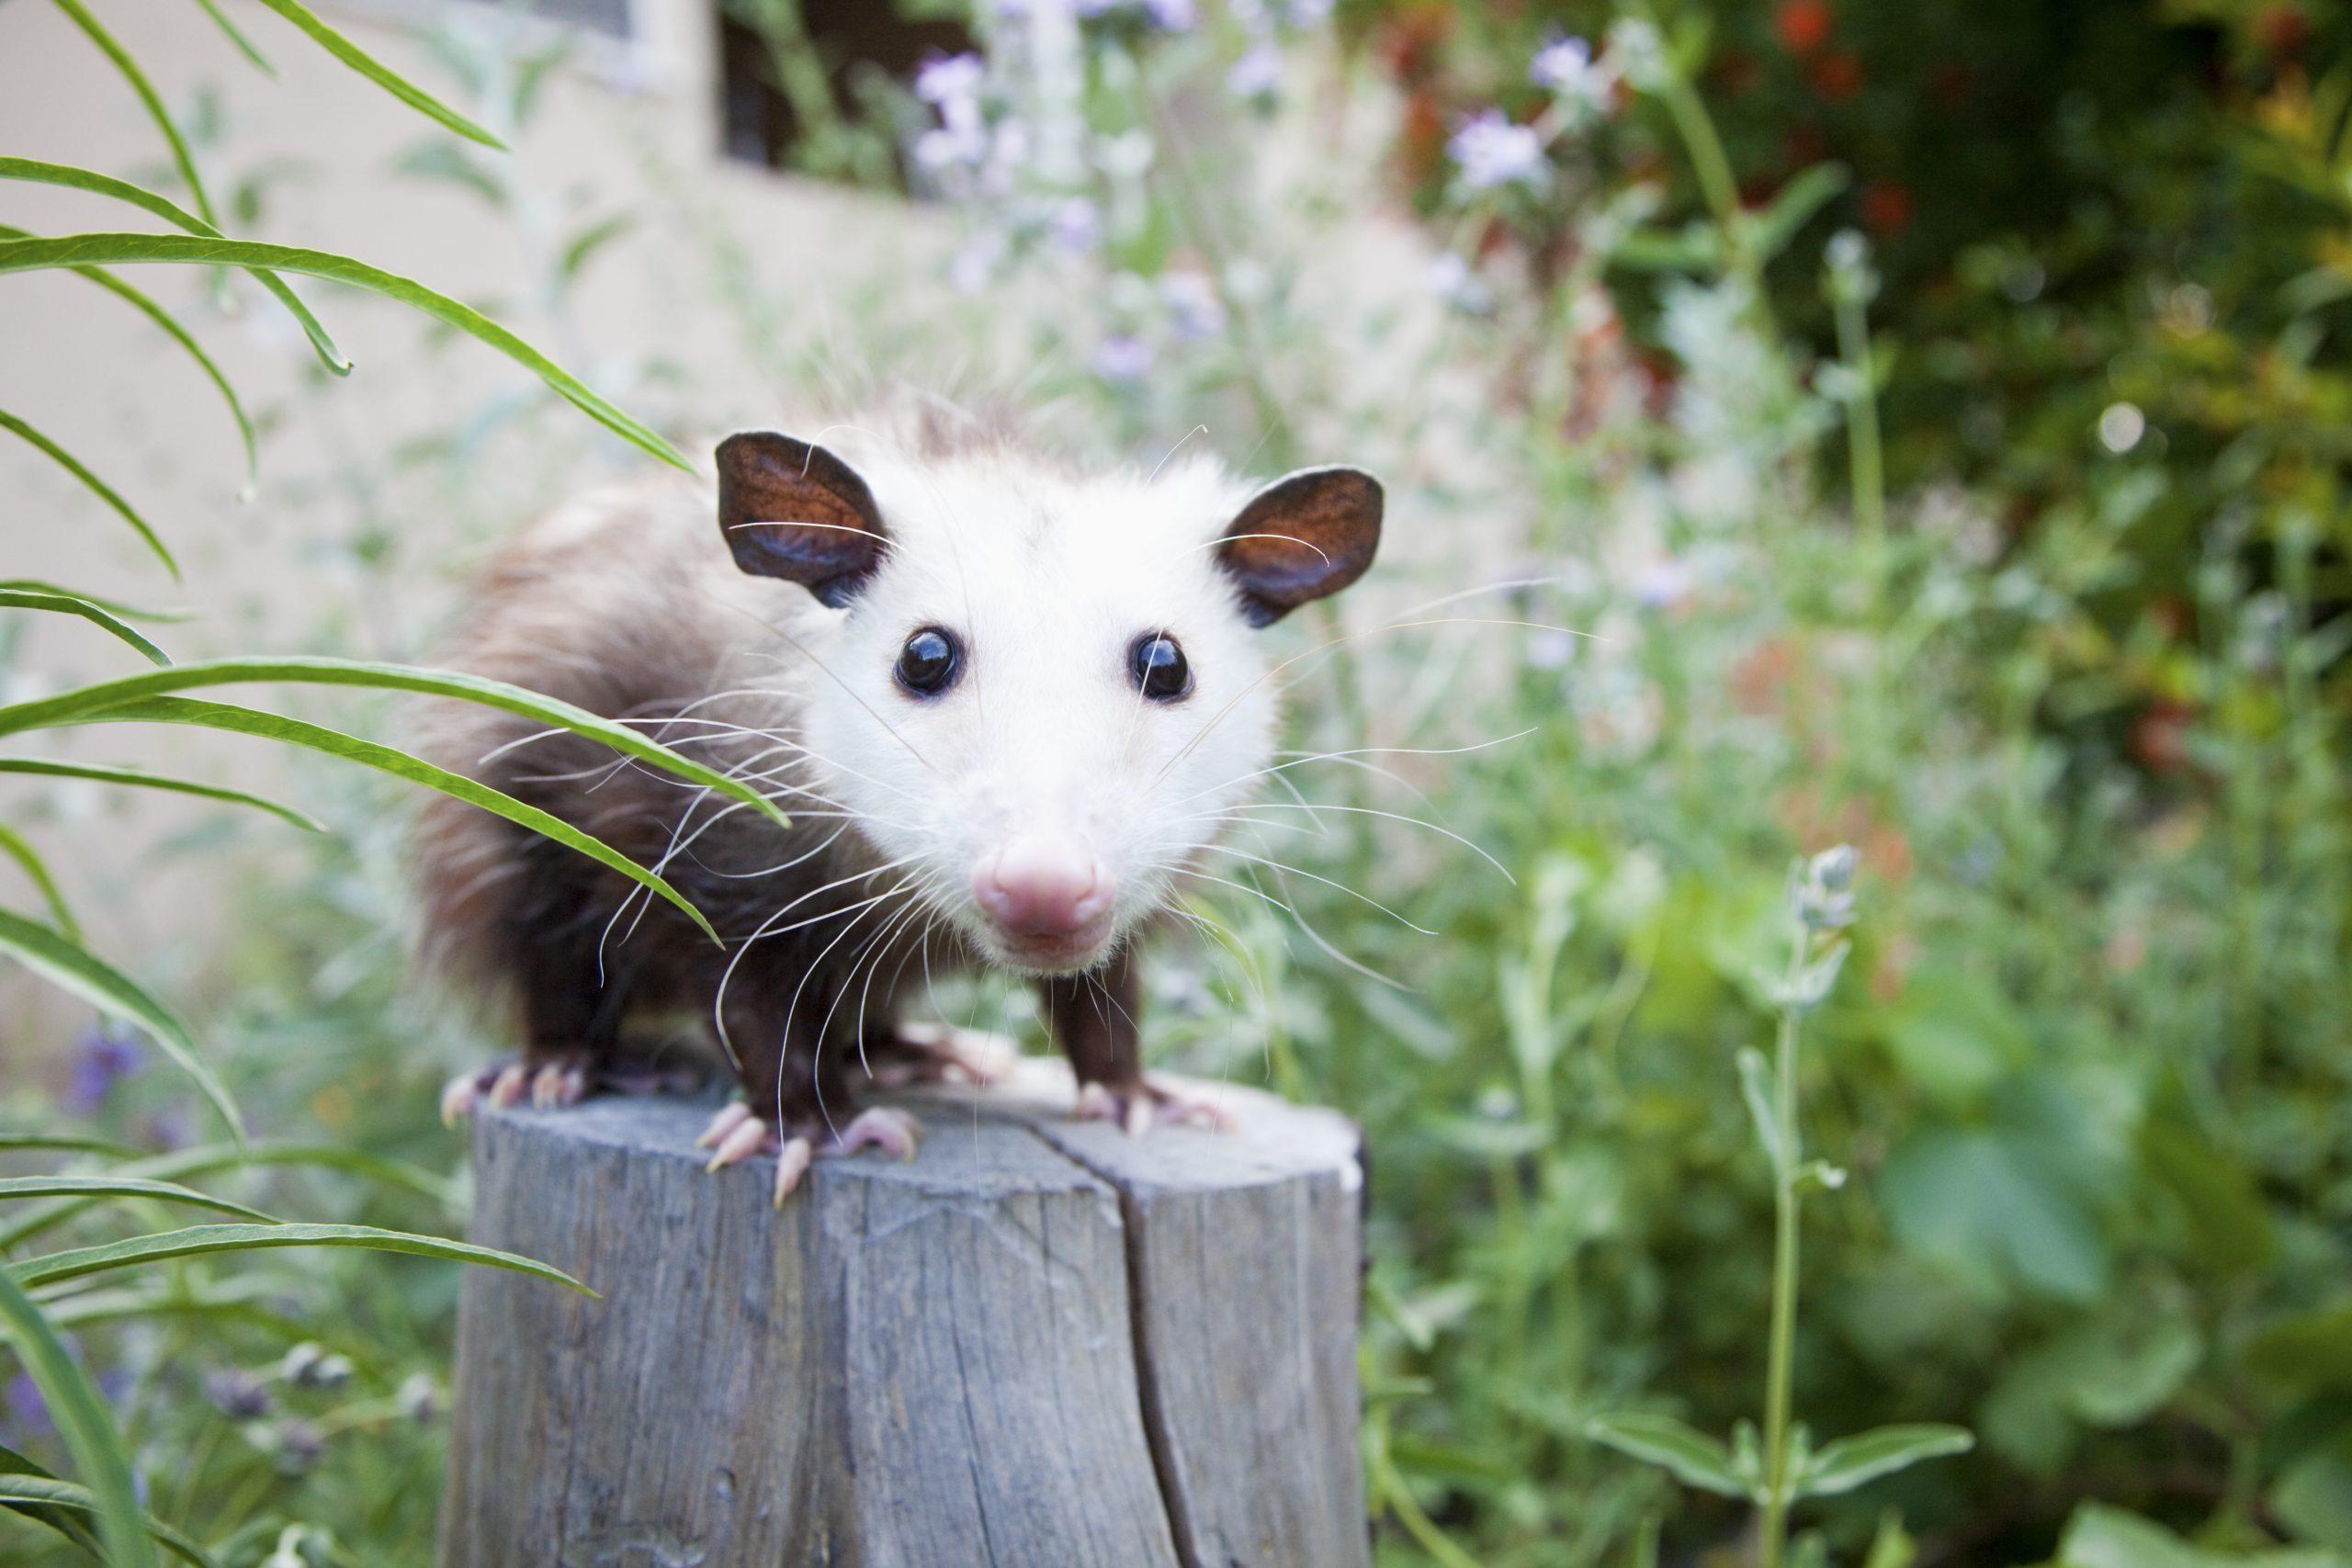 Pet possum on tree stump